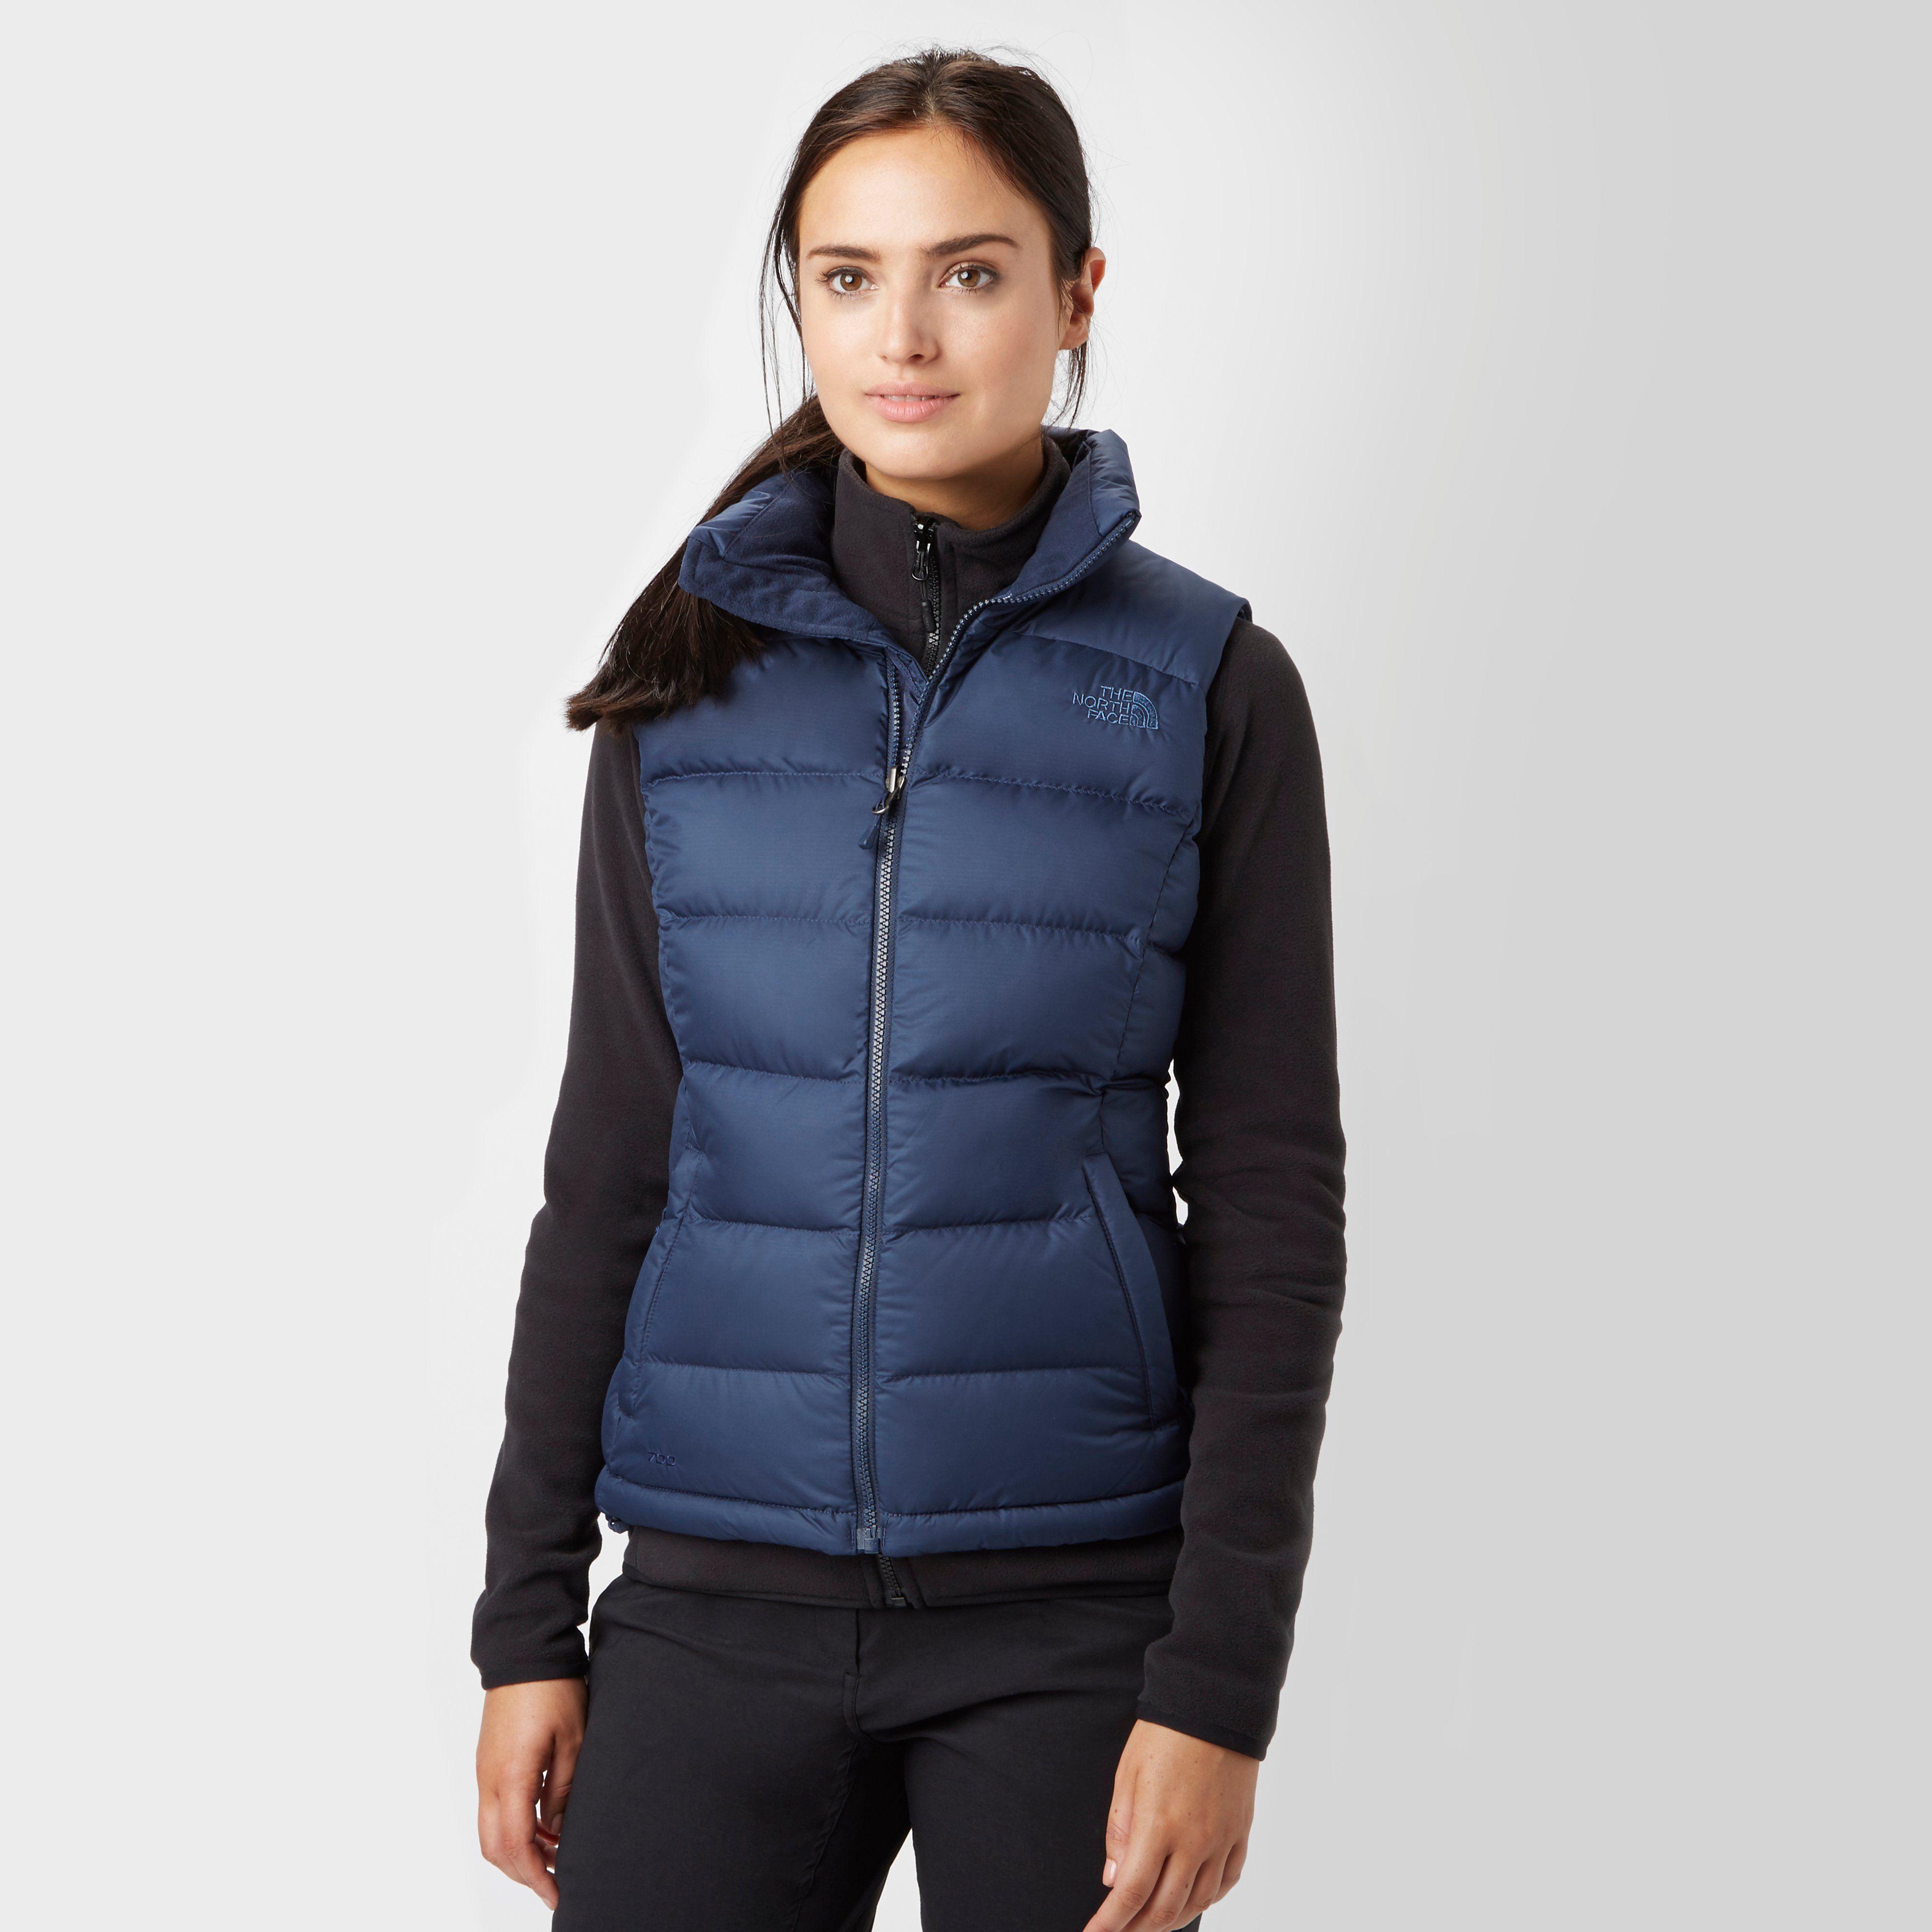 THE NORTH FACE Women's Nuptse 2 Down Vest